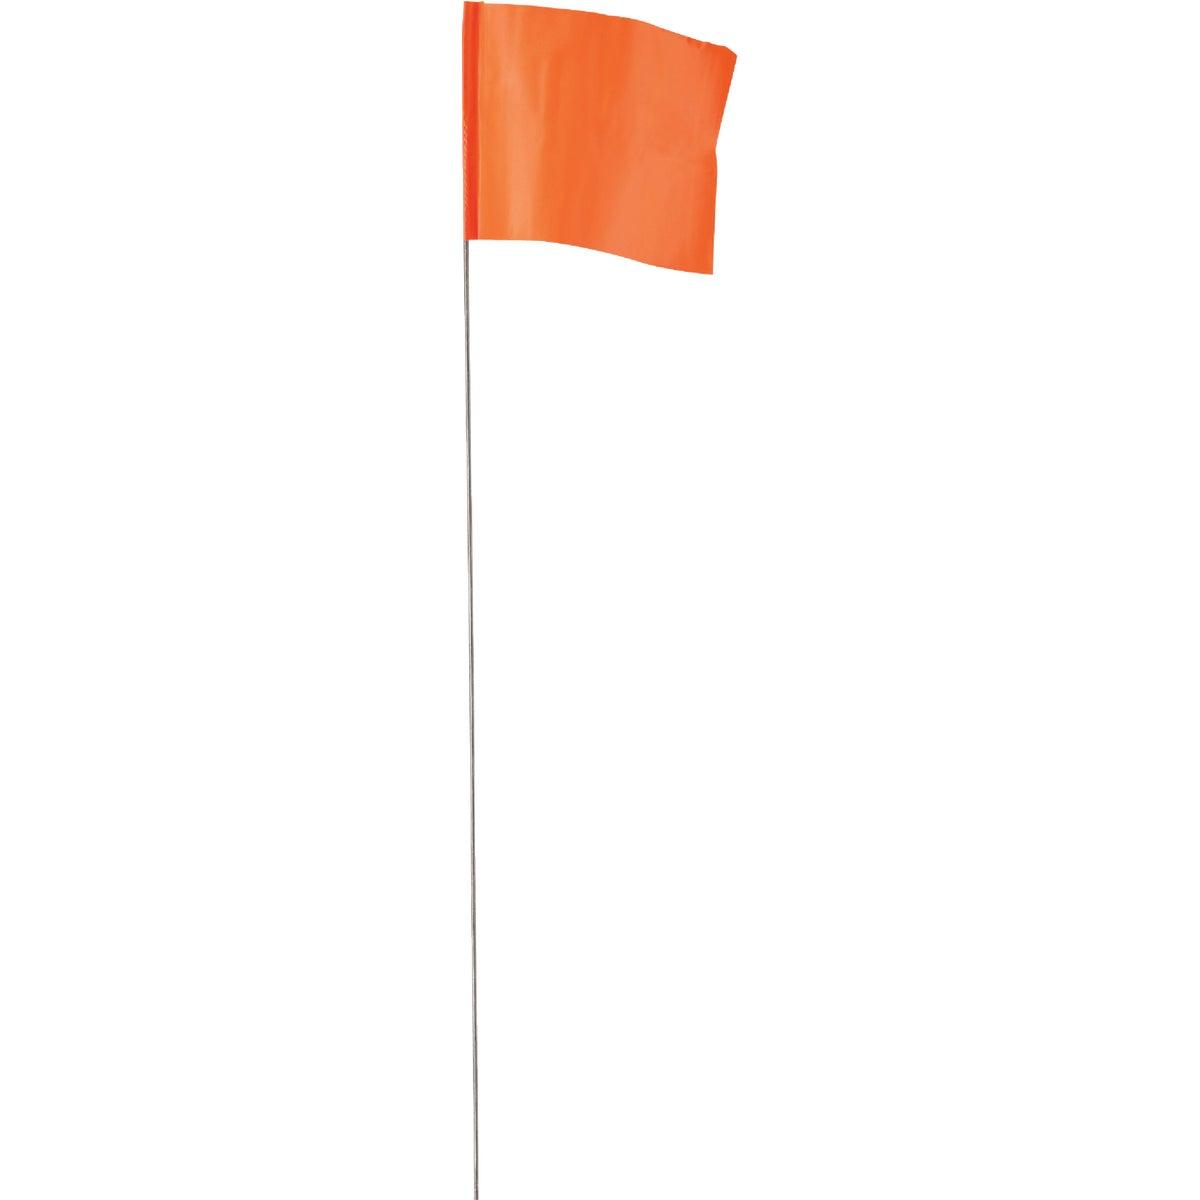 Irwin 100PK ORANGE FLAGS 64100